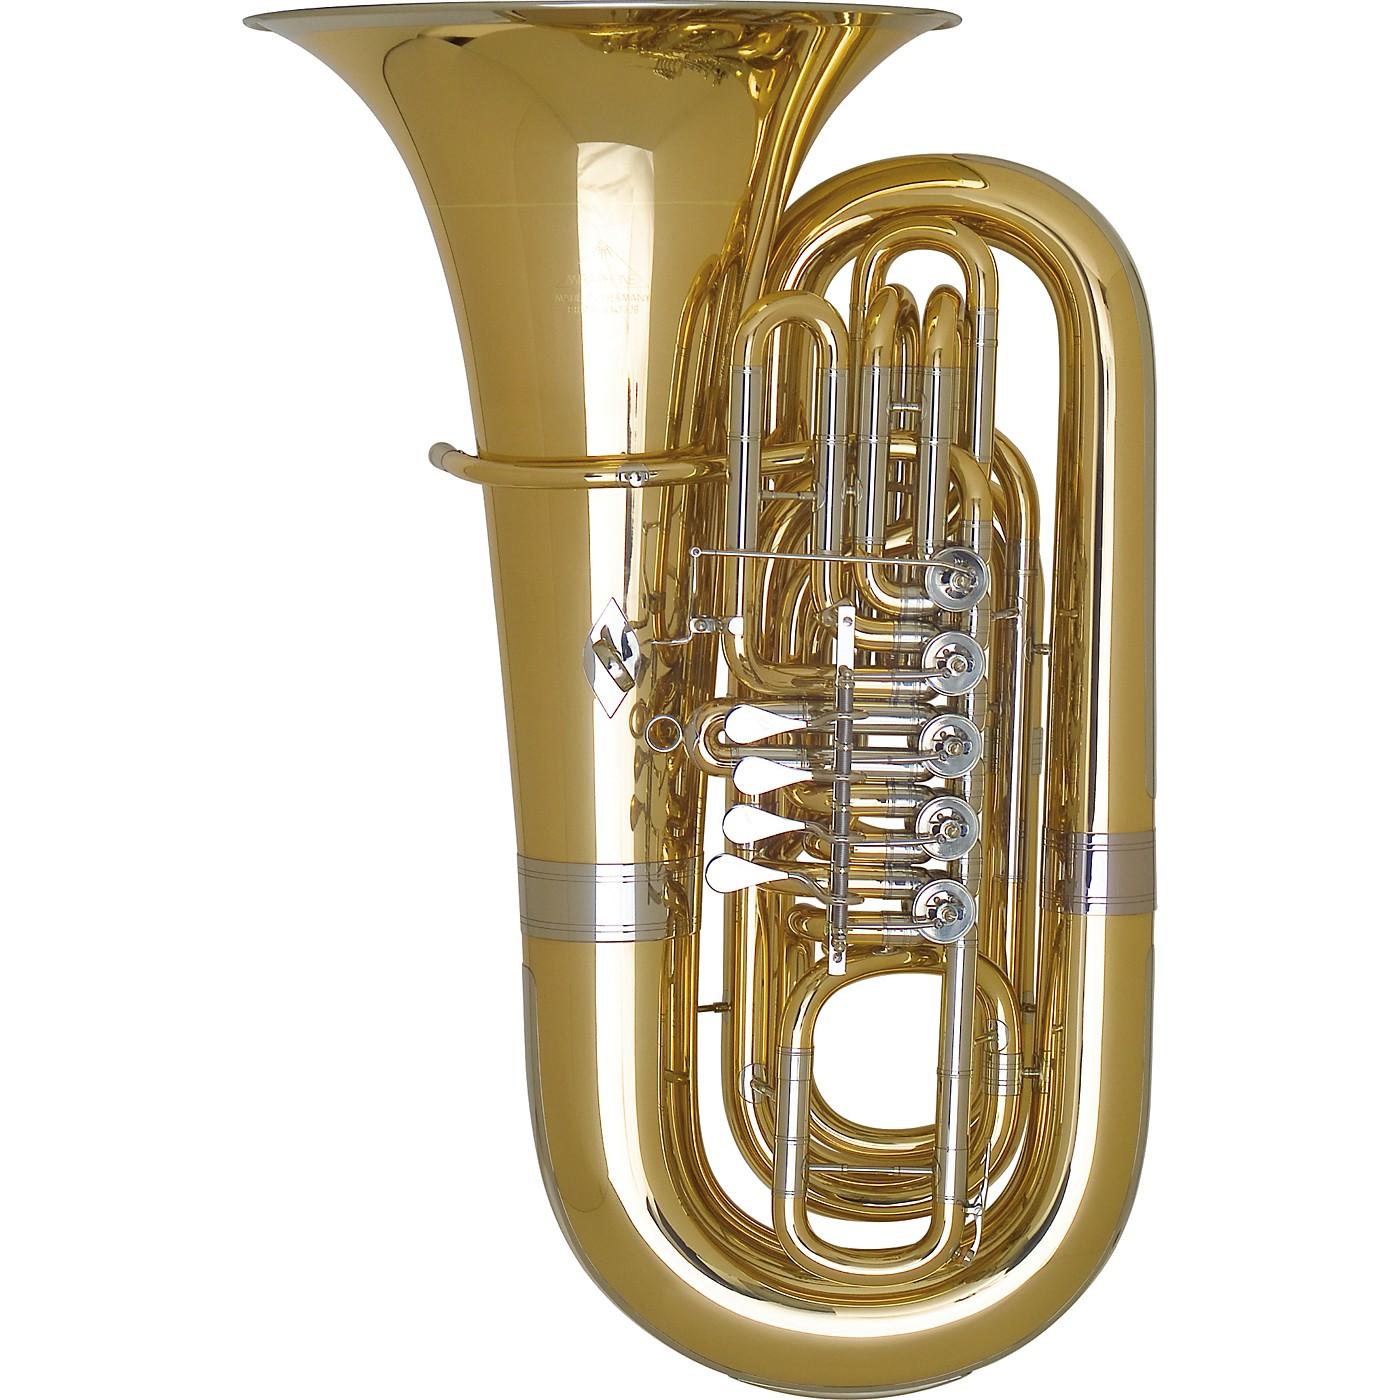 Miraphone 191 Series 5/4 BBb Tuba thumbnail